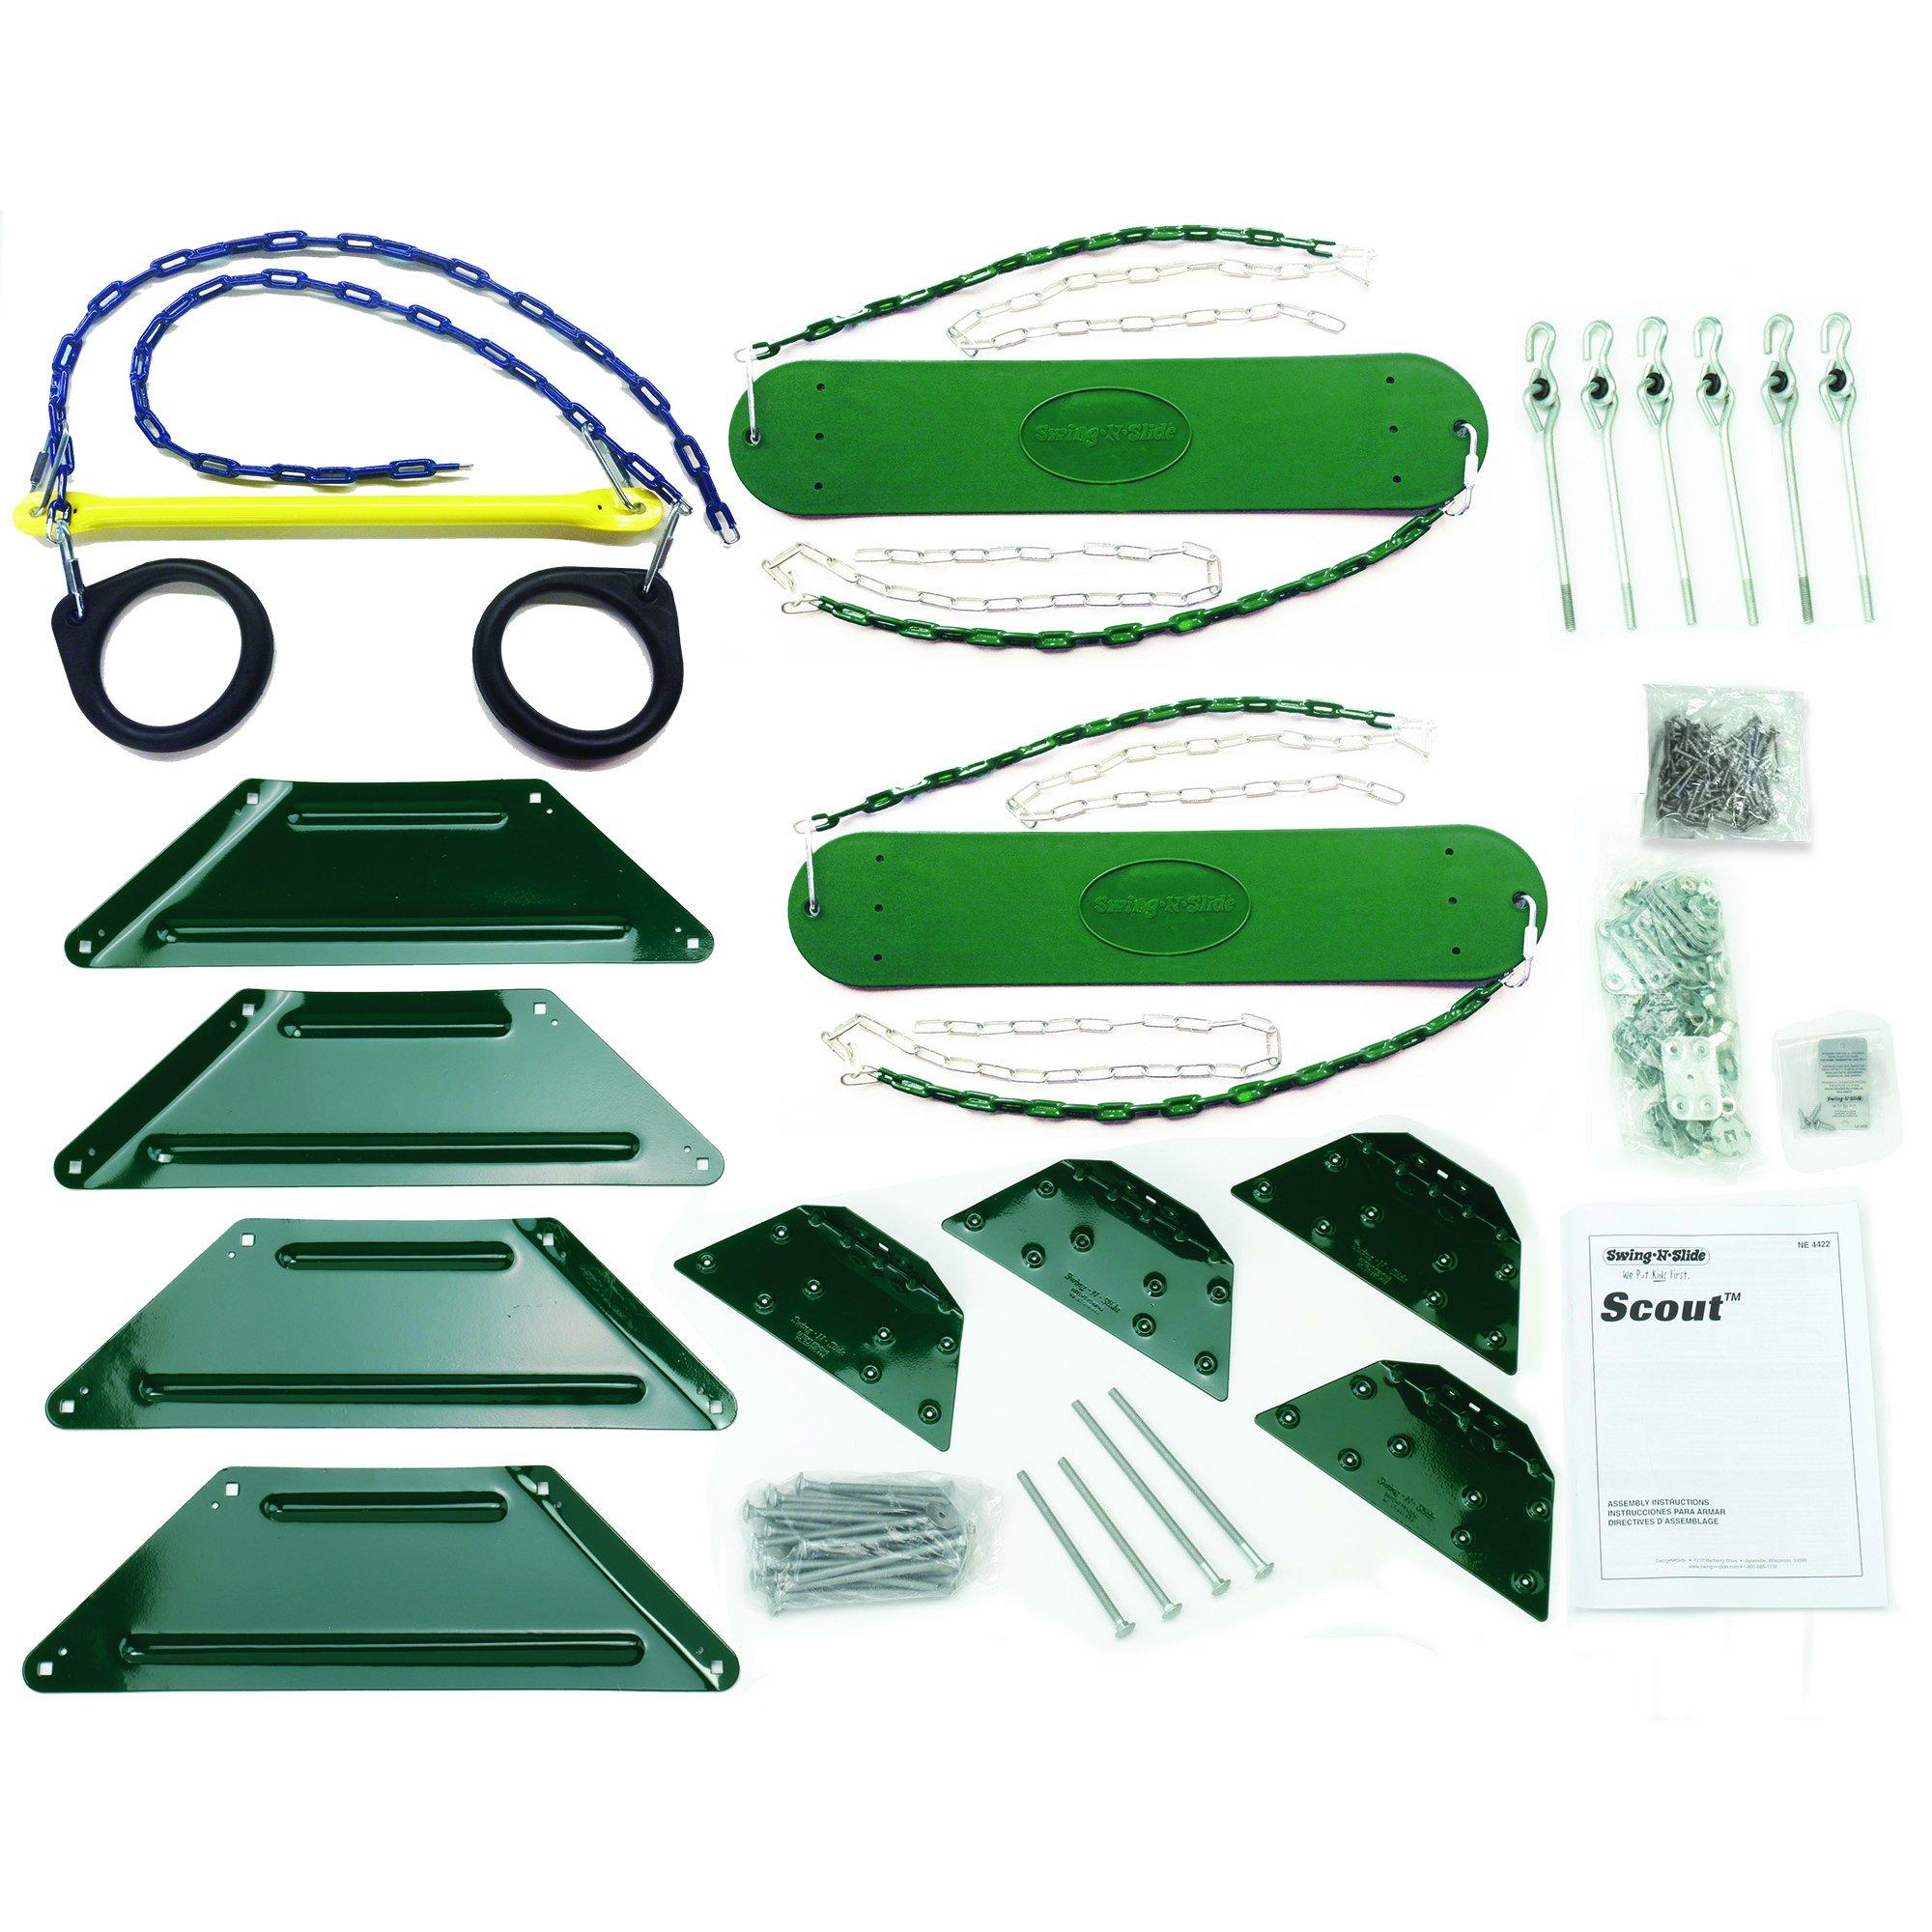 Scout Custom DIY Play Set Hardware Kit (wood not included) by Swing-N-Slide